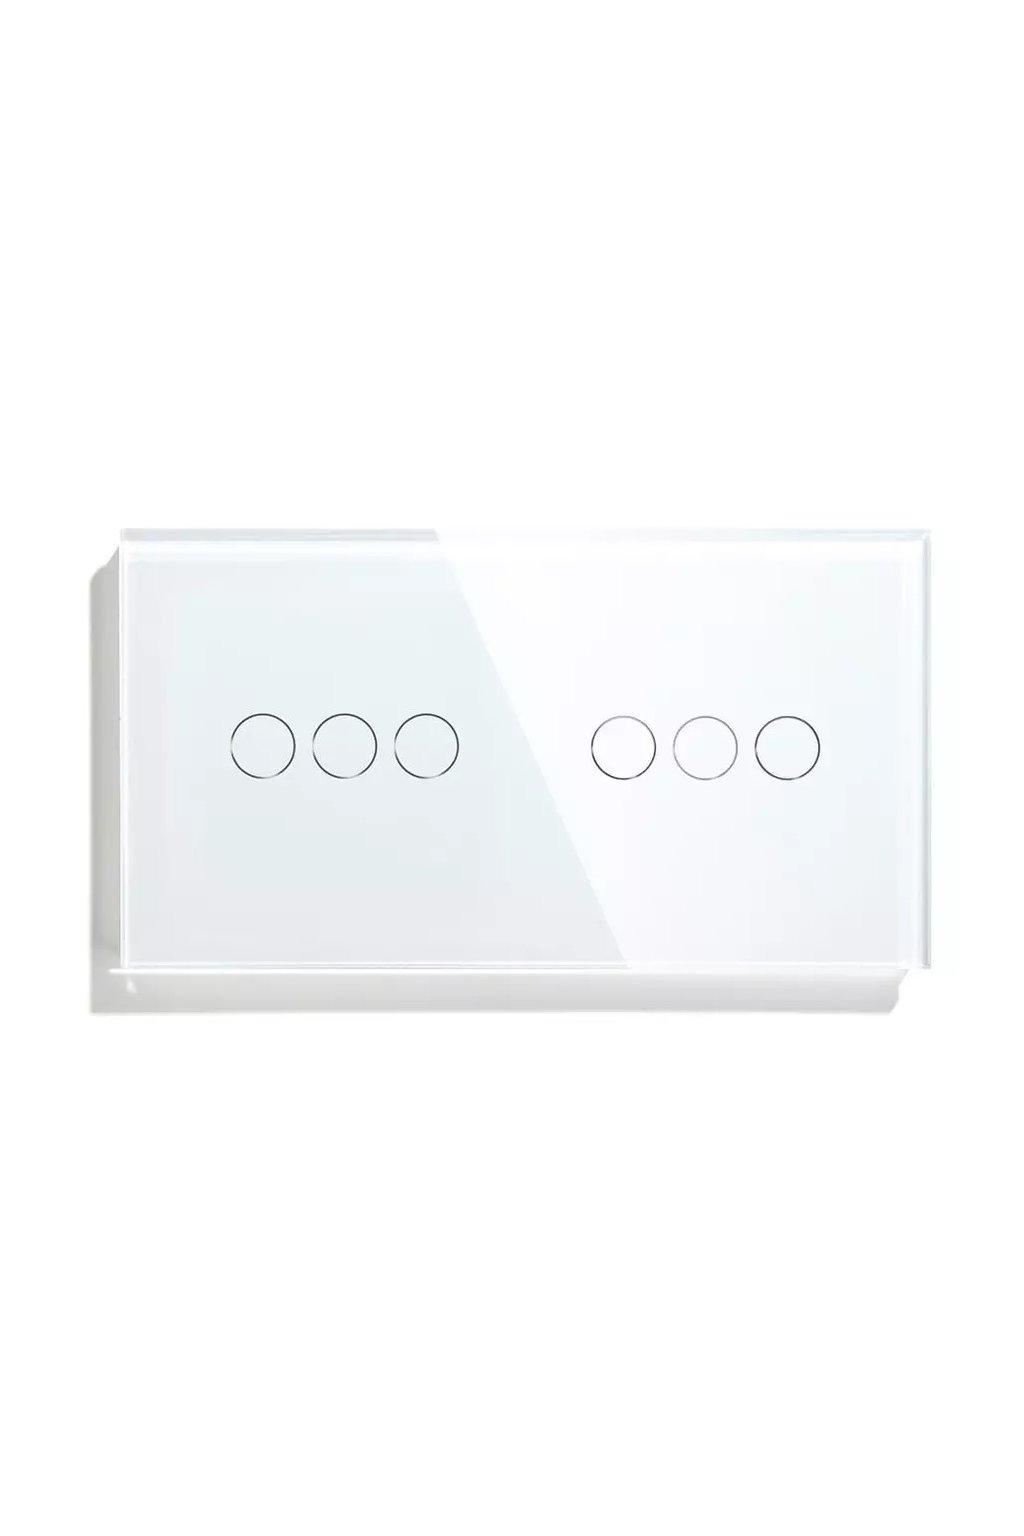 Sklenený 2-panel: 3 okruhy + 3 okruhy